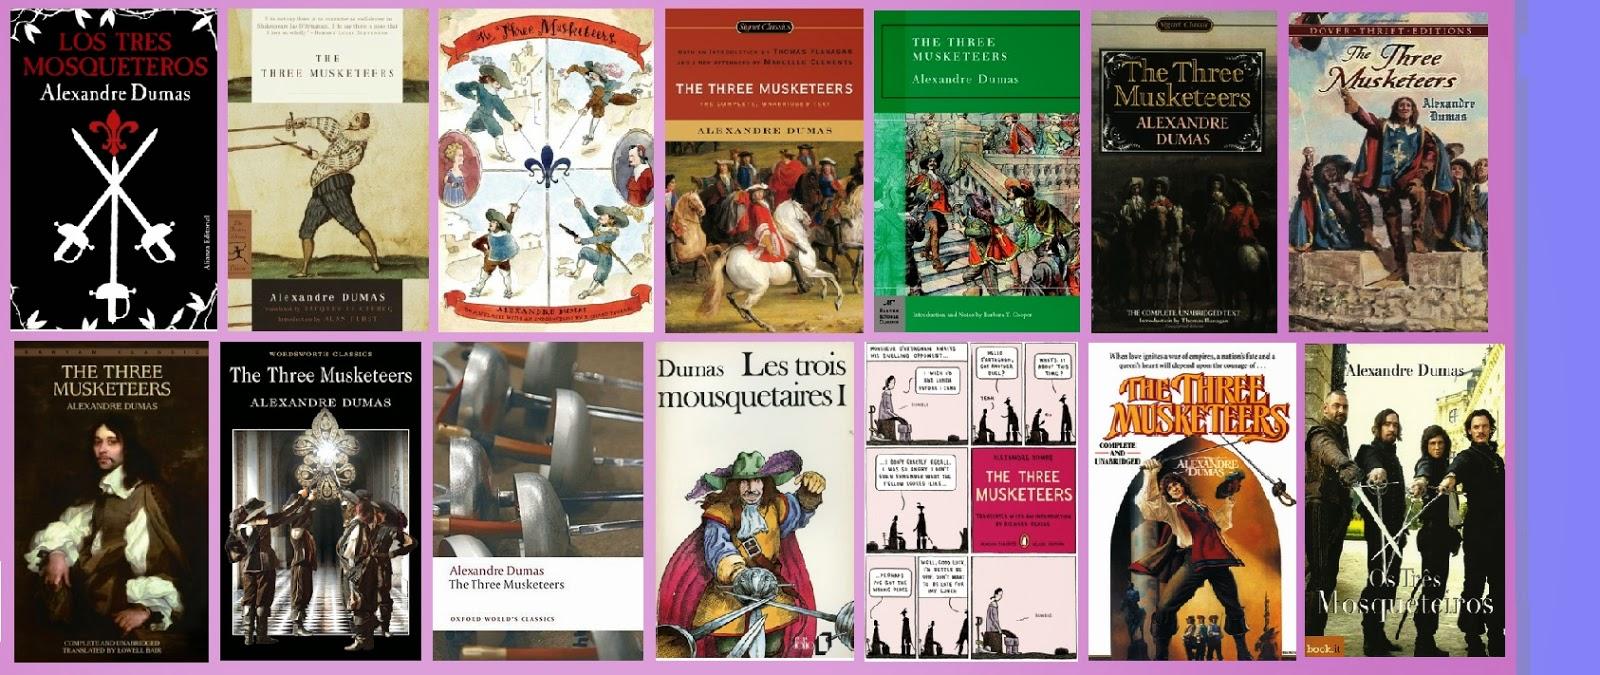 Portadas de la novela clásica de aventuras histórica Los tres mosqueteros, de Alejandro Dumas